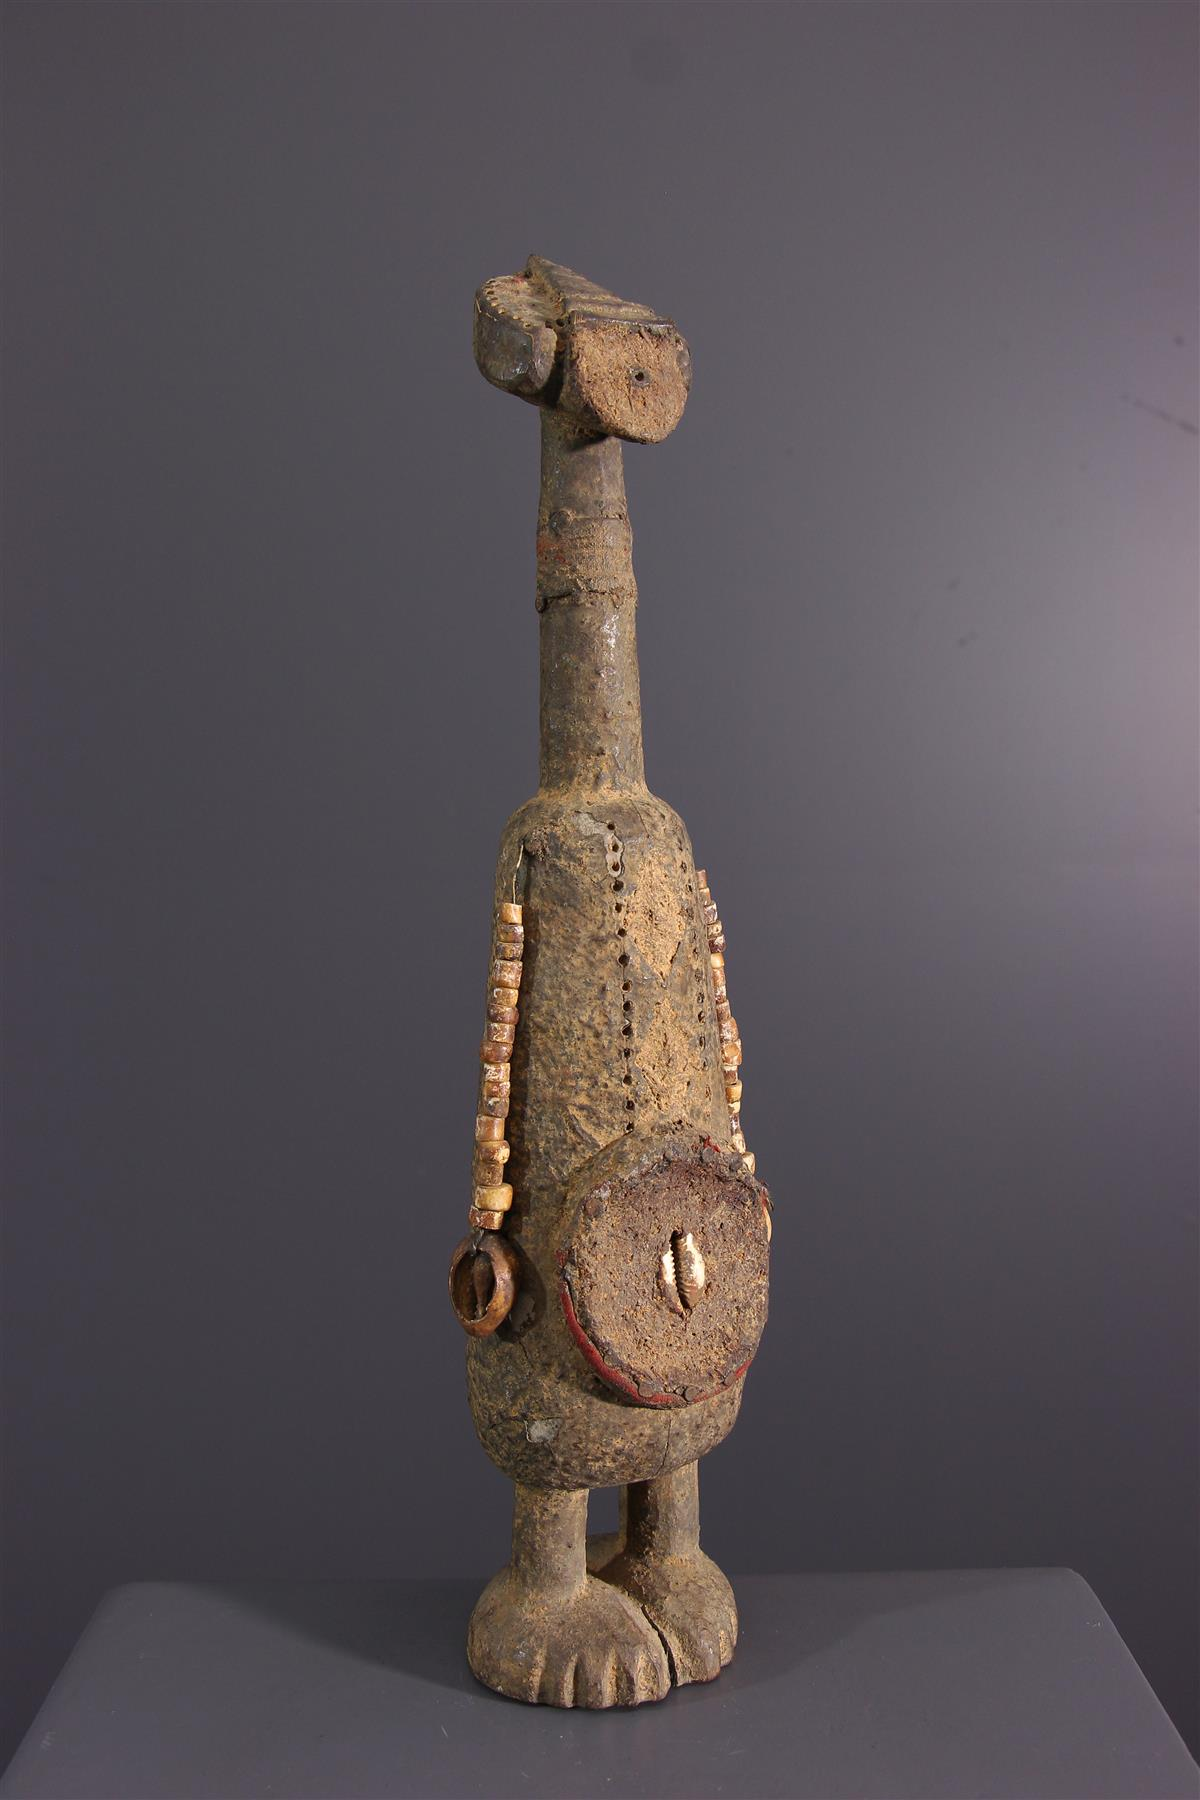 Namchi doll - Tribal art